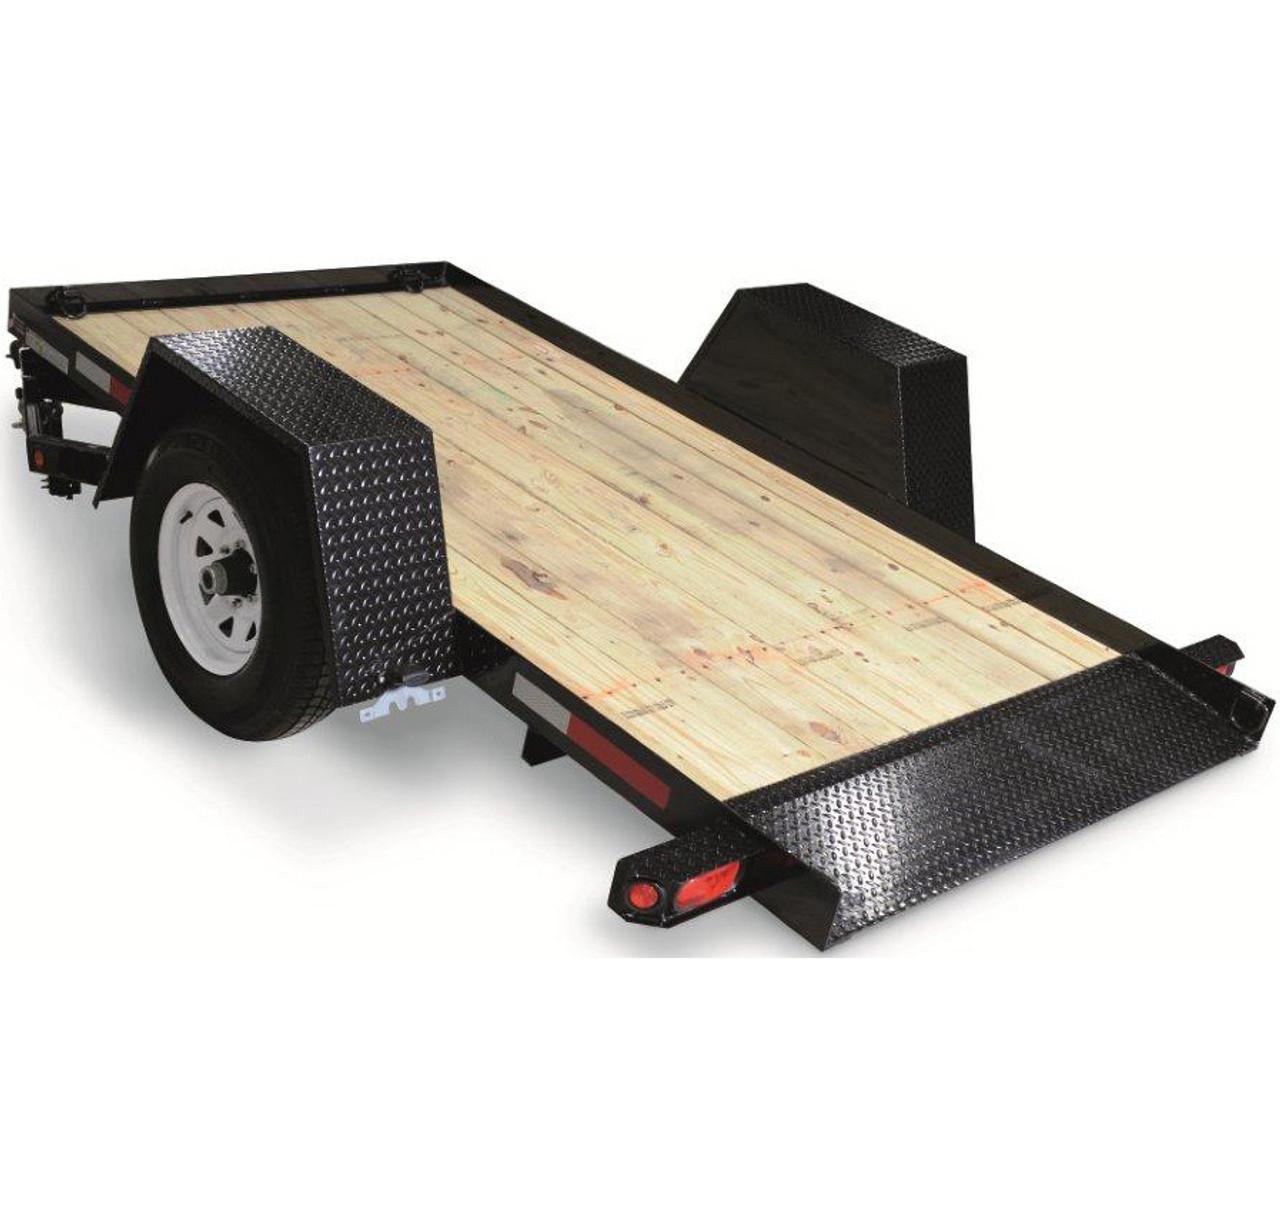 CT5010TSA4EL --- 5' x 10' Pan Tilt-Bed with Electric Brakes